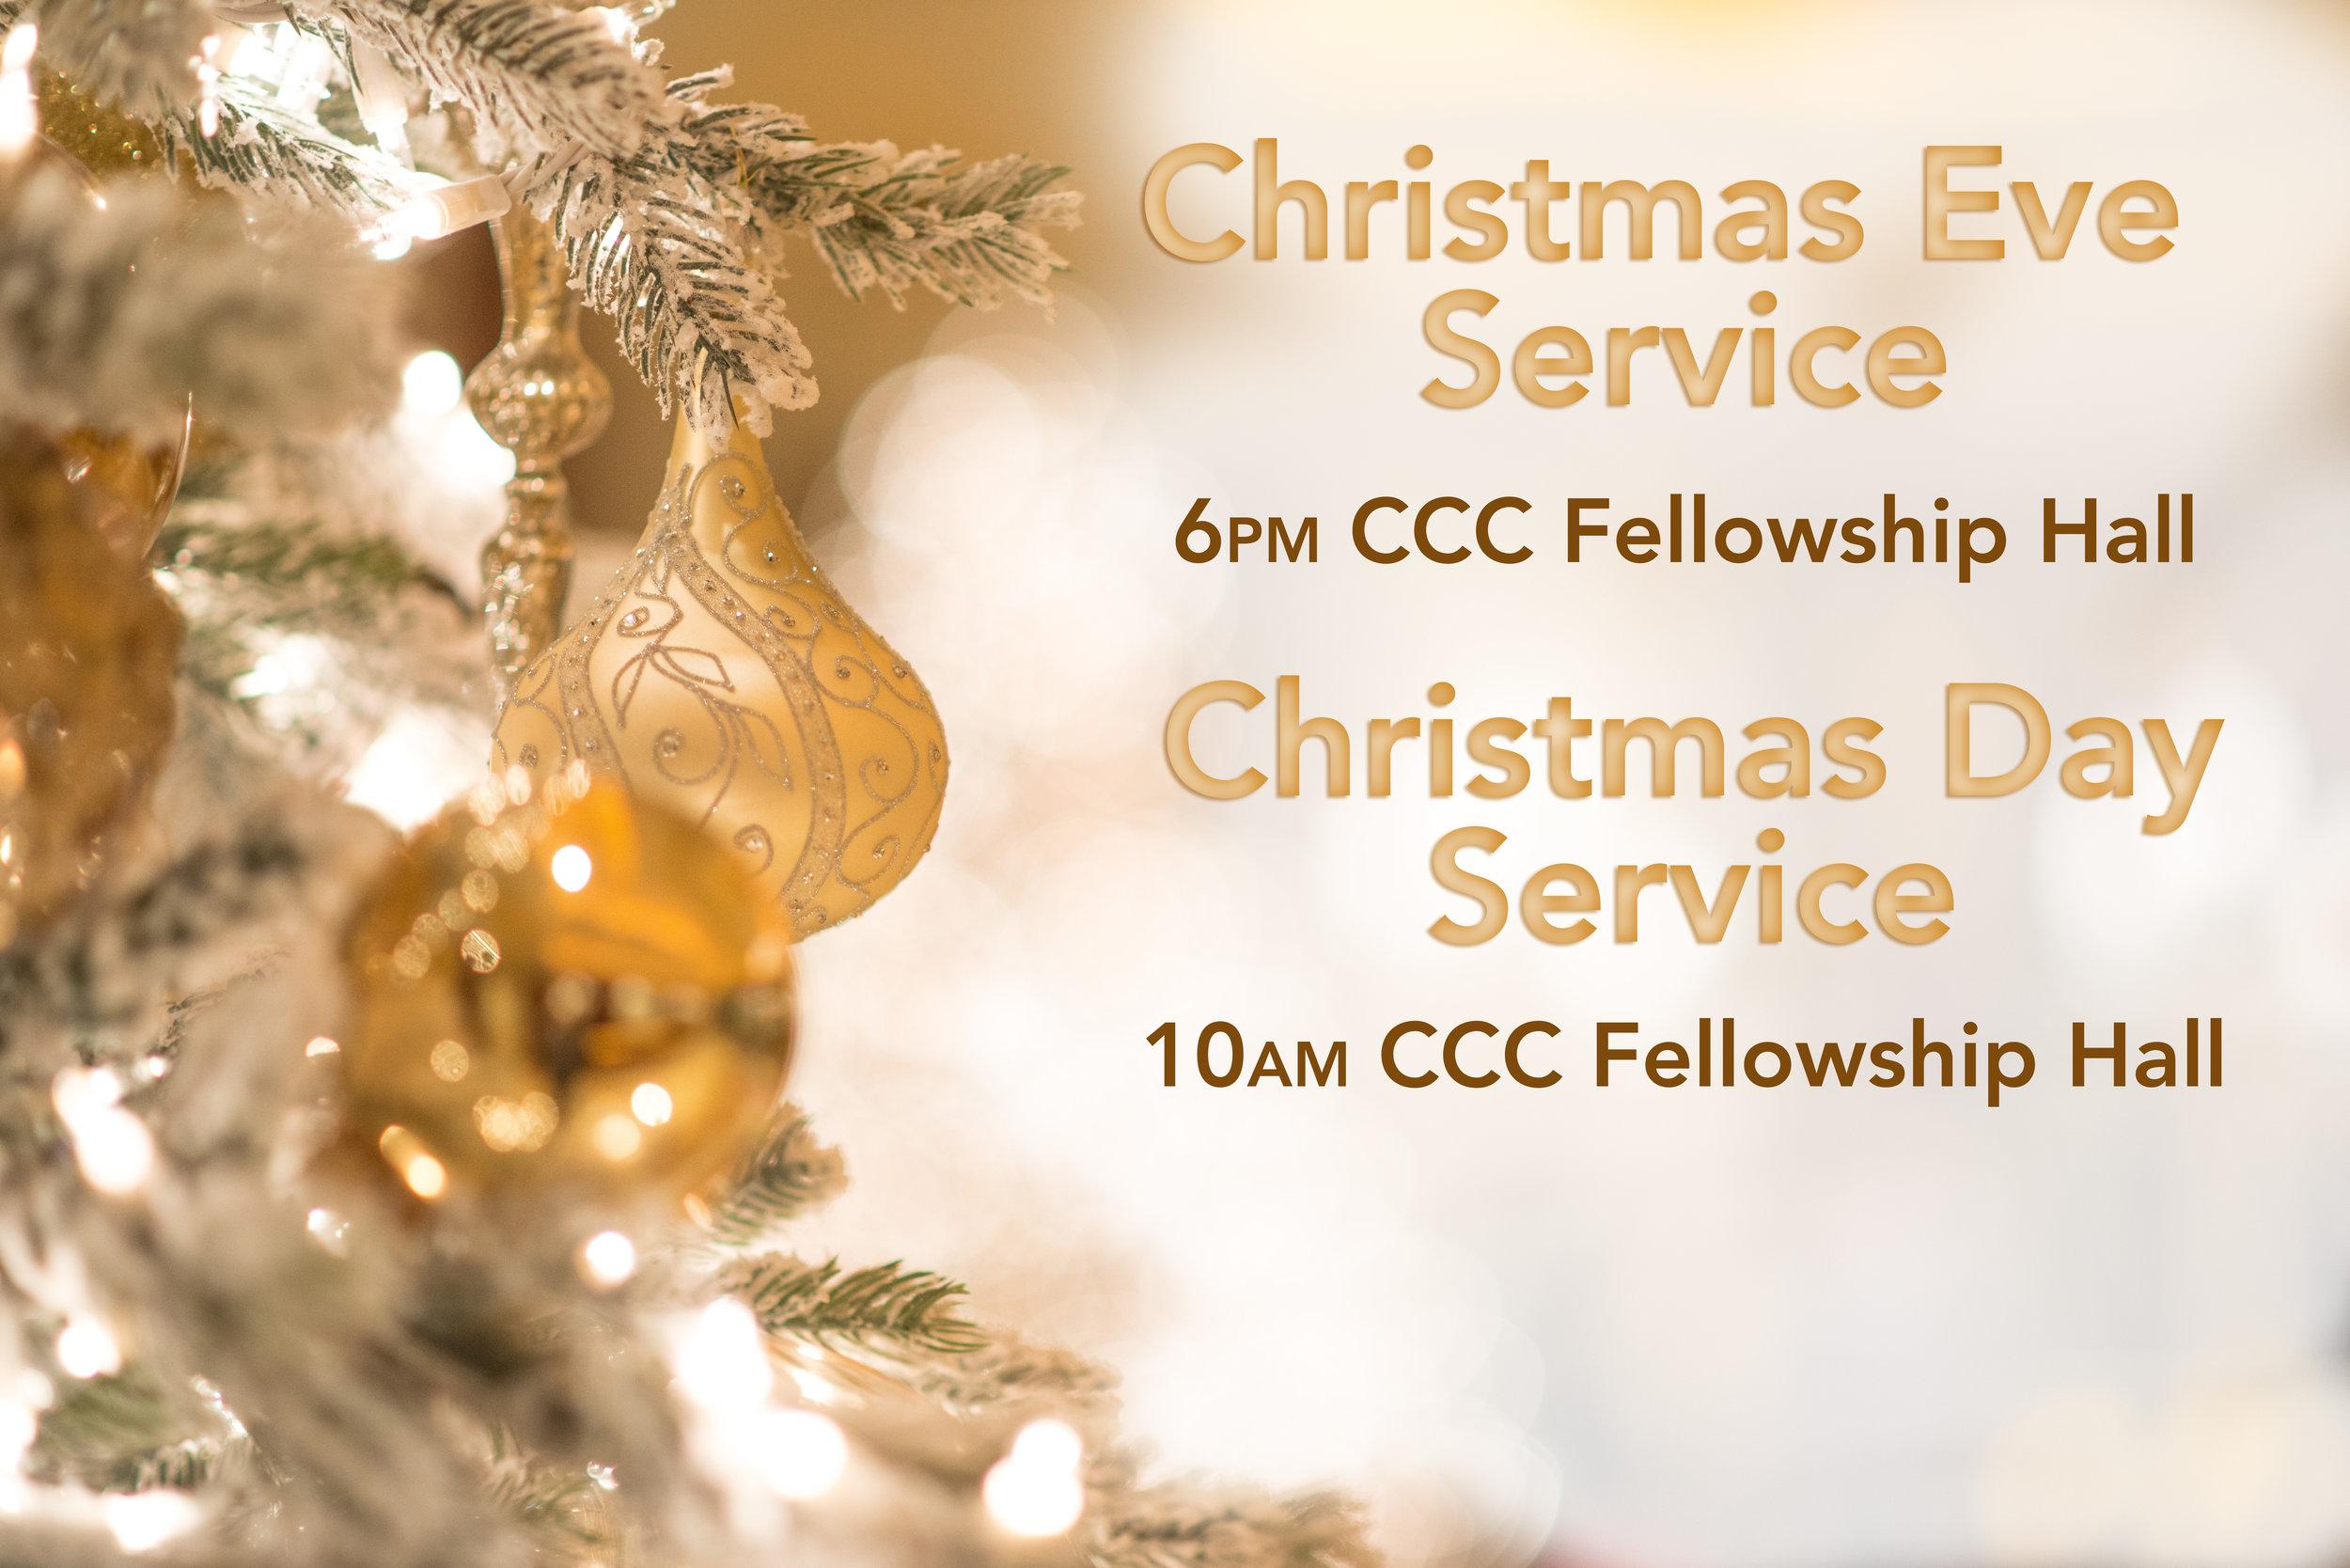 Christmas Eve Service: 6 pm CCC Fellowship Hall.